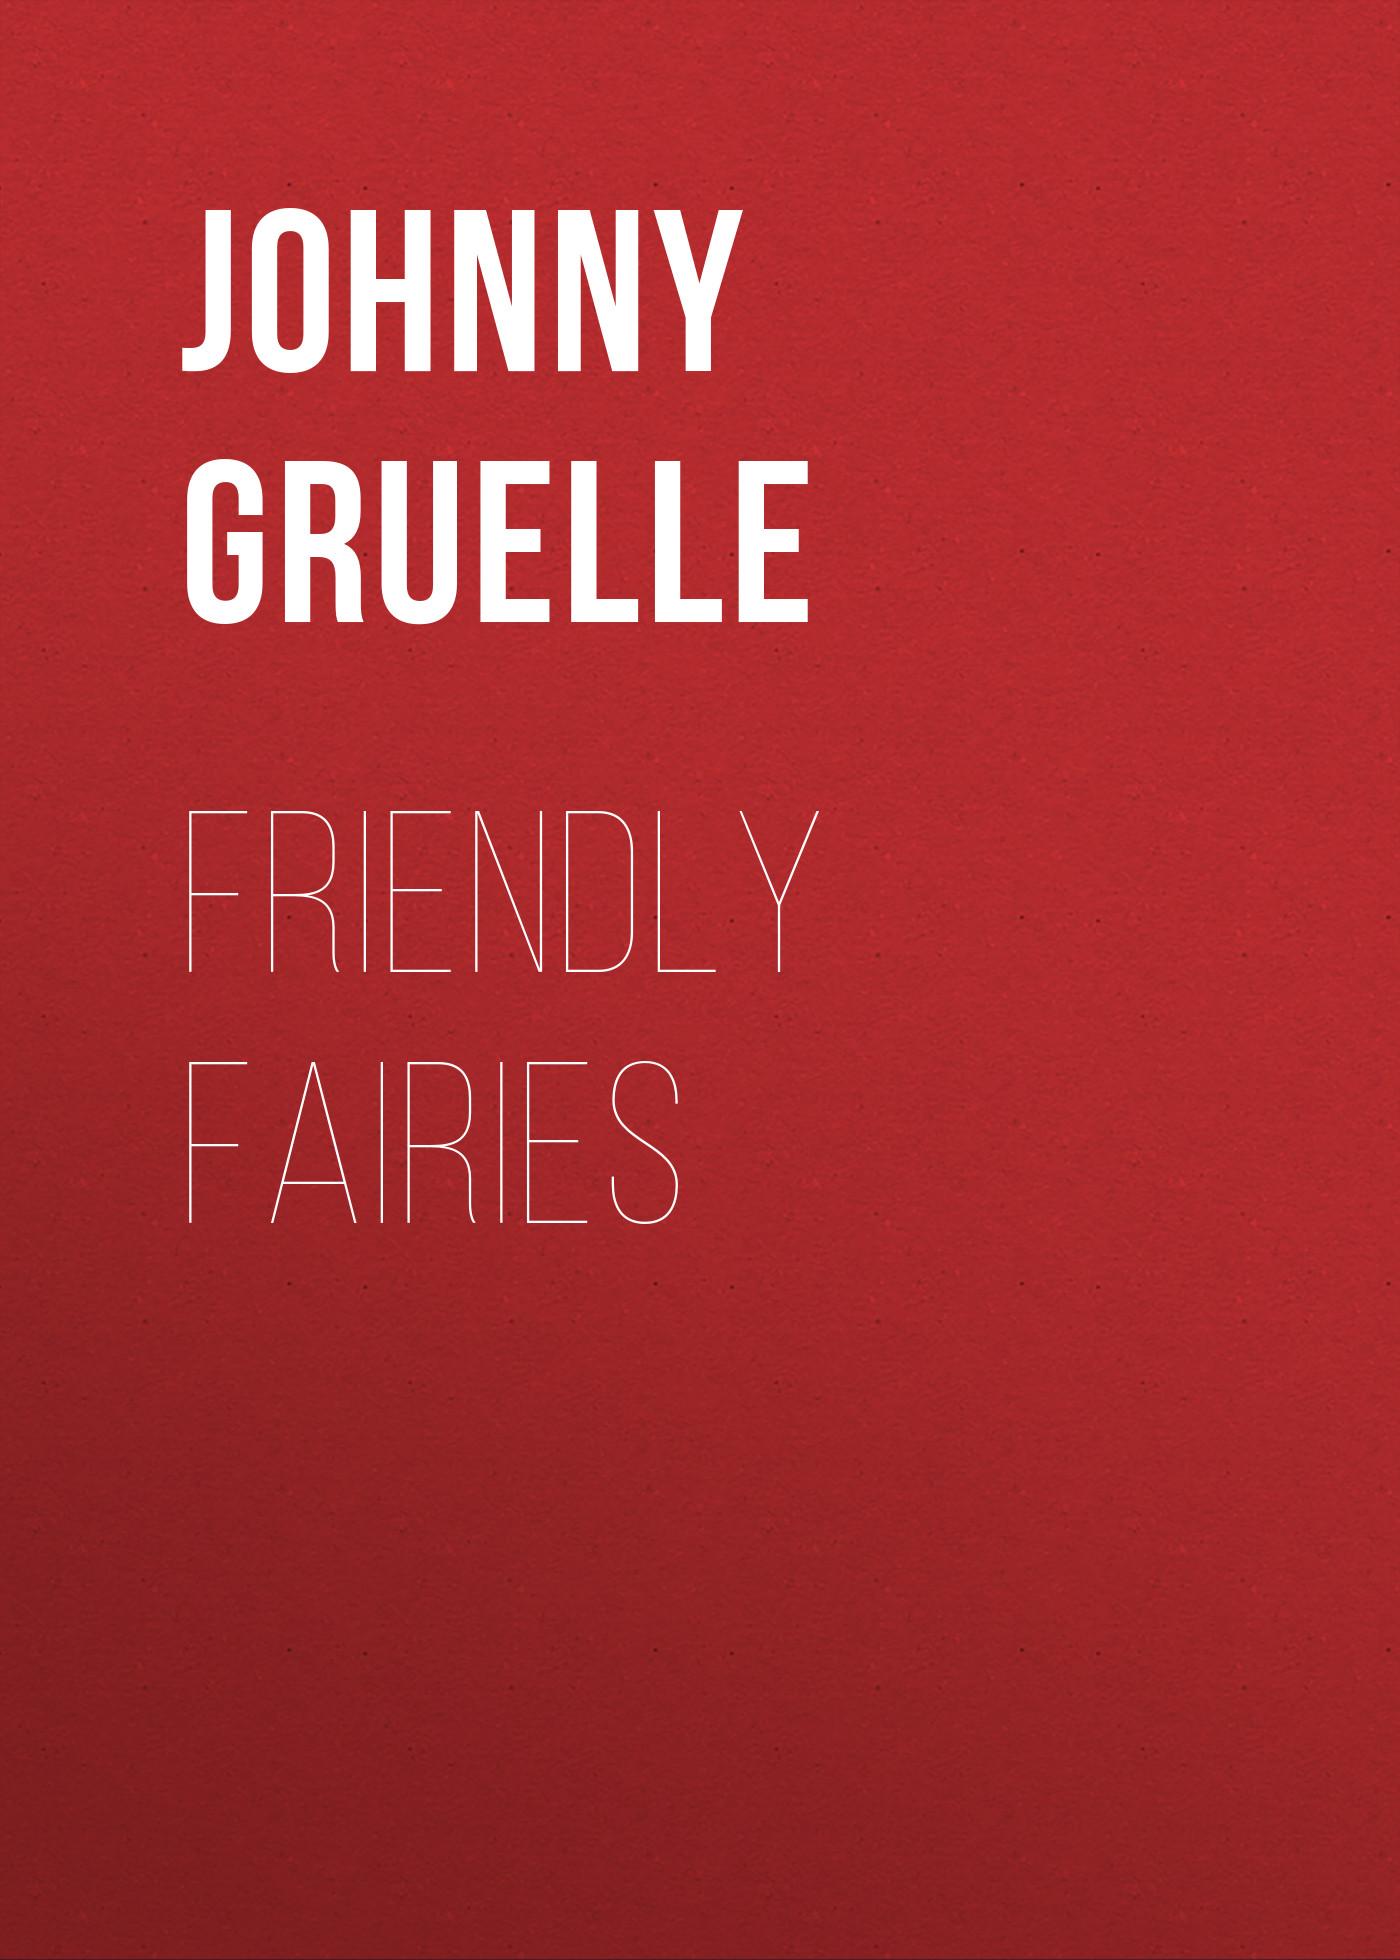 Johnny Gruelle Friendly Fairies pink fairies pink fairies neverneverland